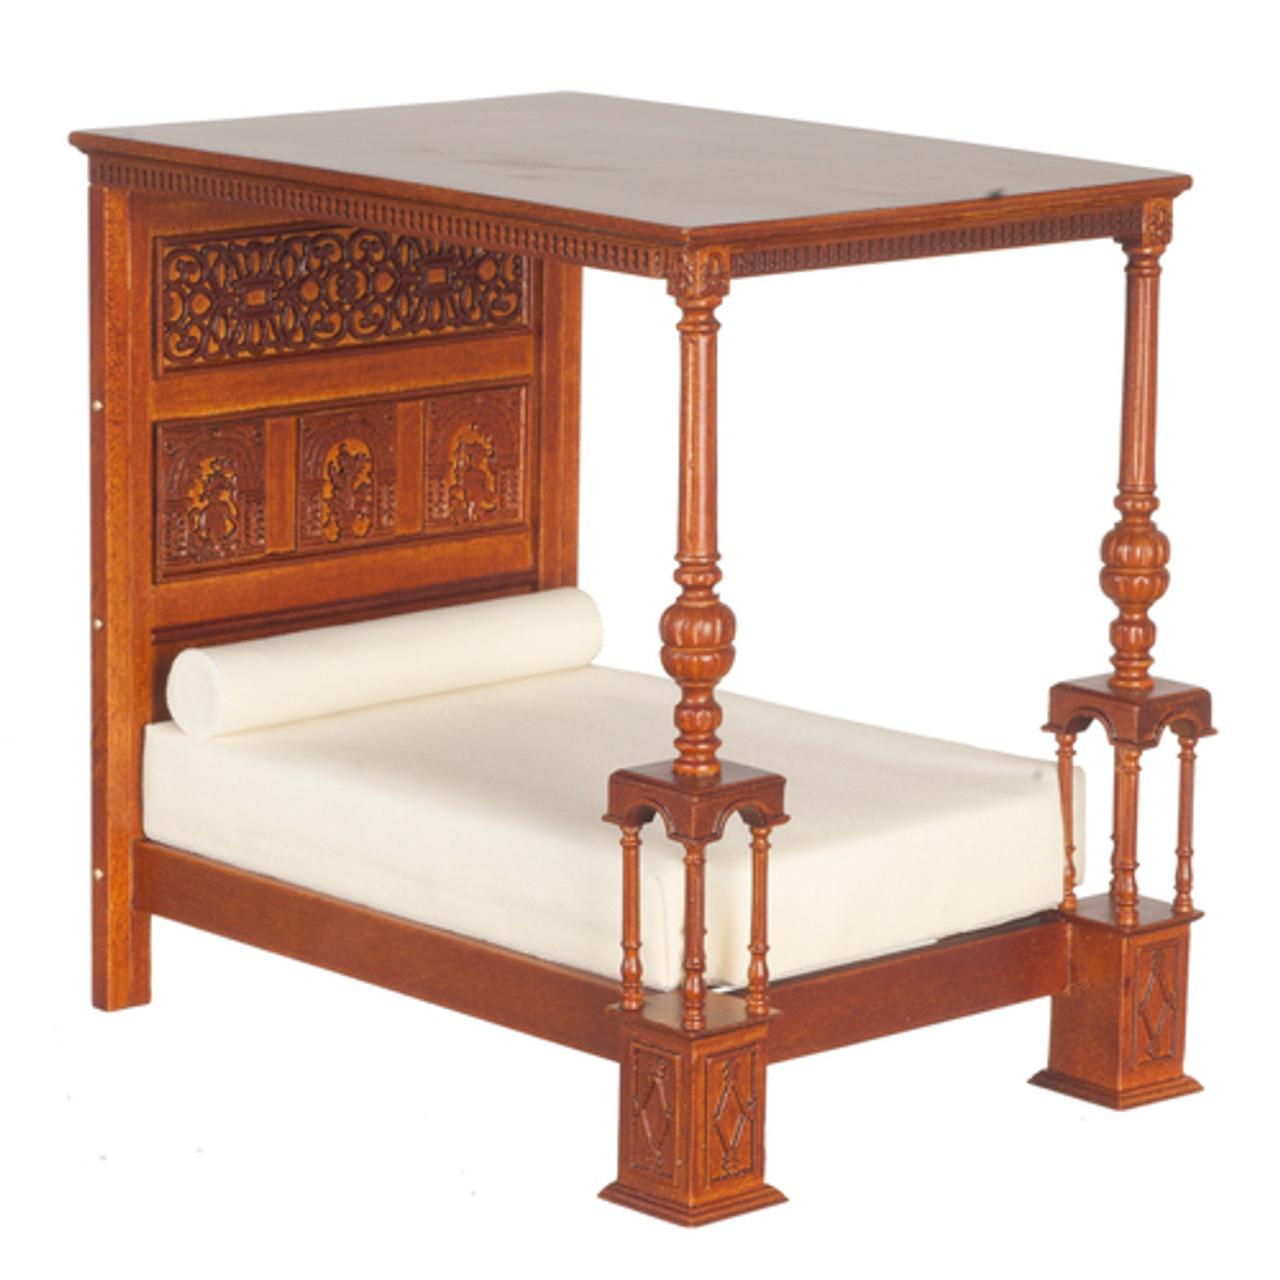 Tudor Bed - Walnut